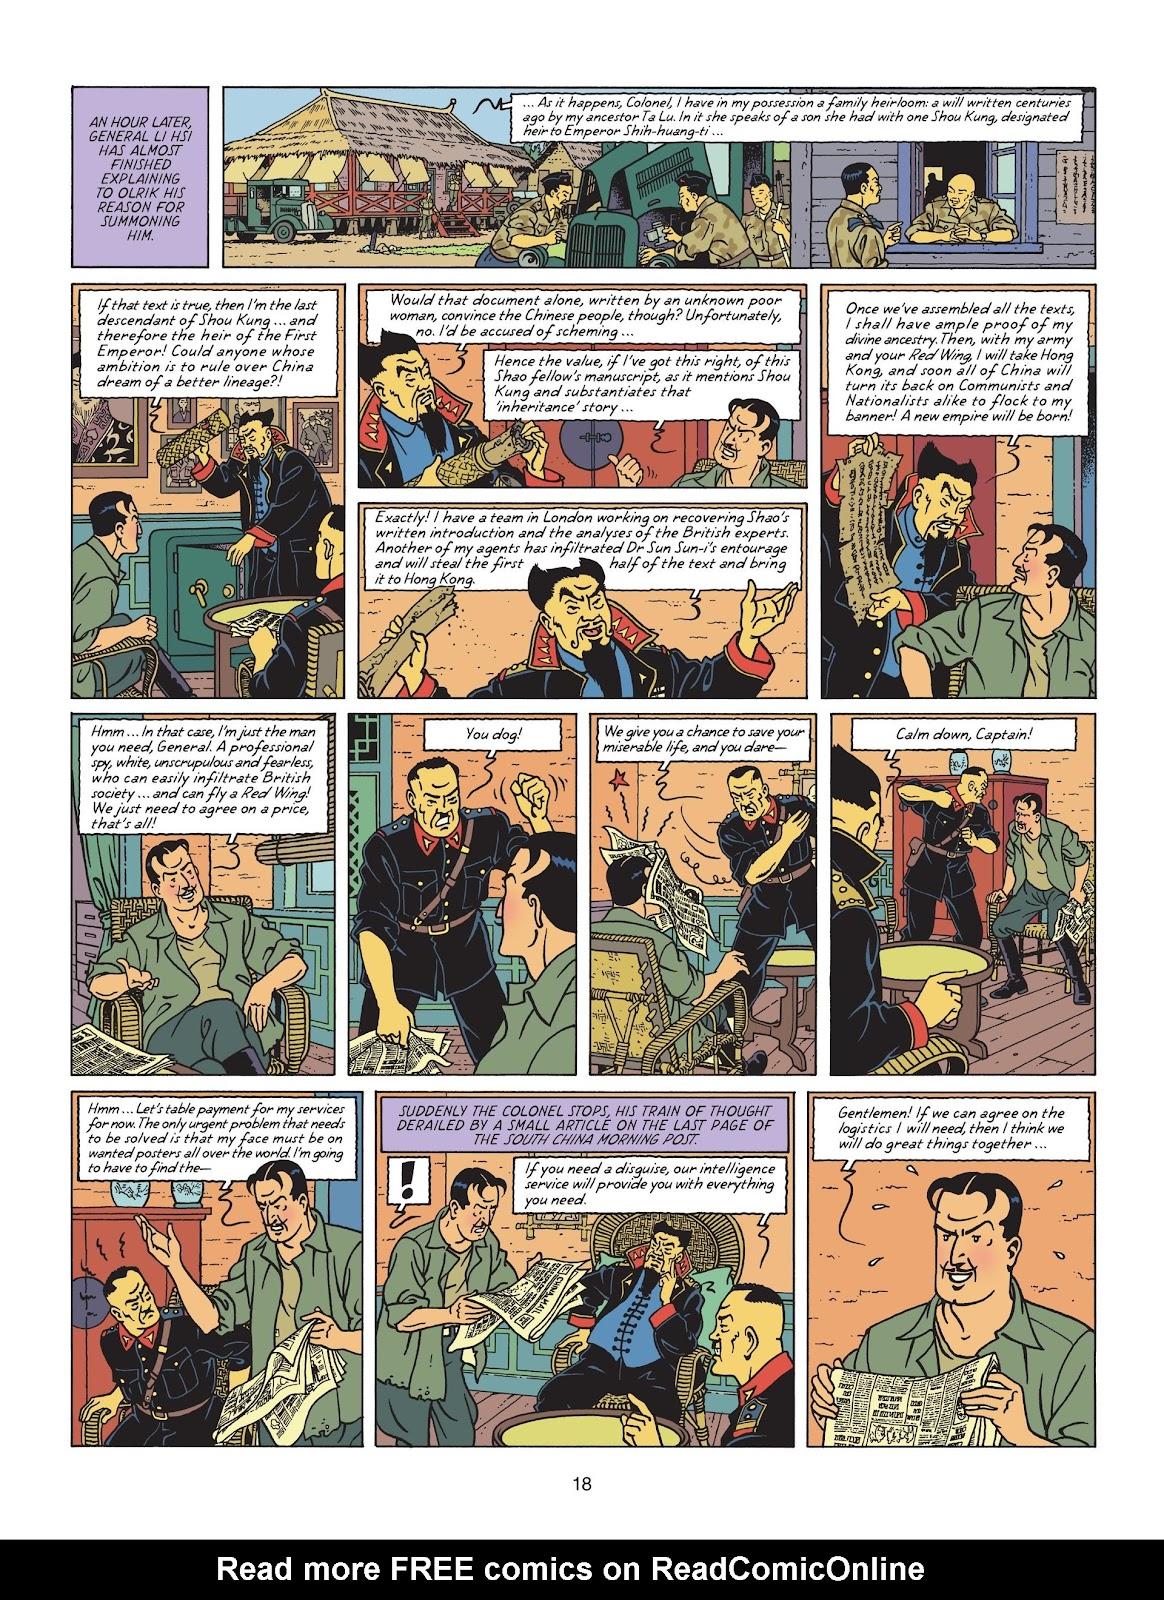 Read online Blake & Mortimer comic -  Issue #25 - 20